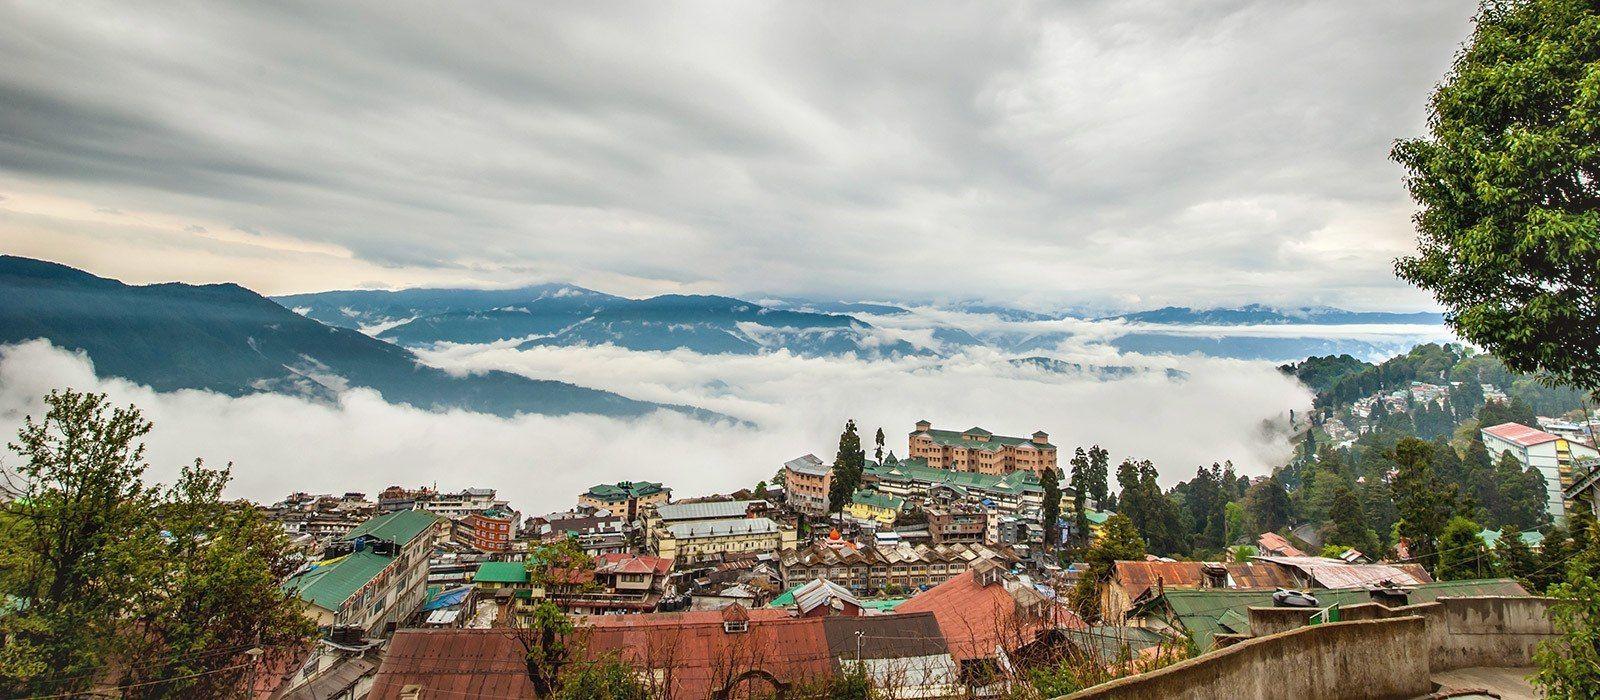 Darjeeling: Teegenuss & Berge Urlaub 6